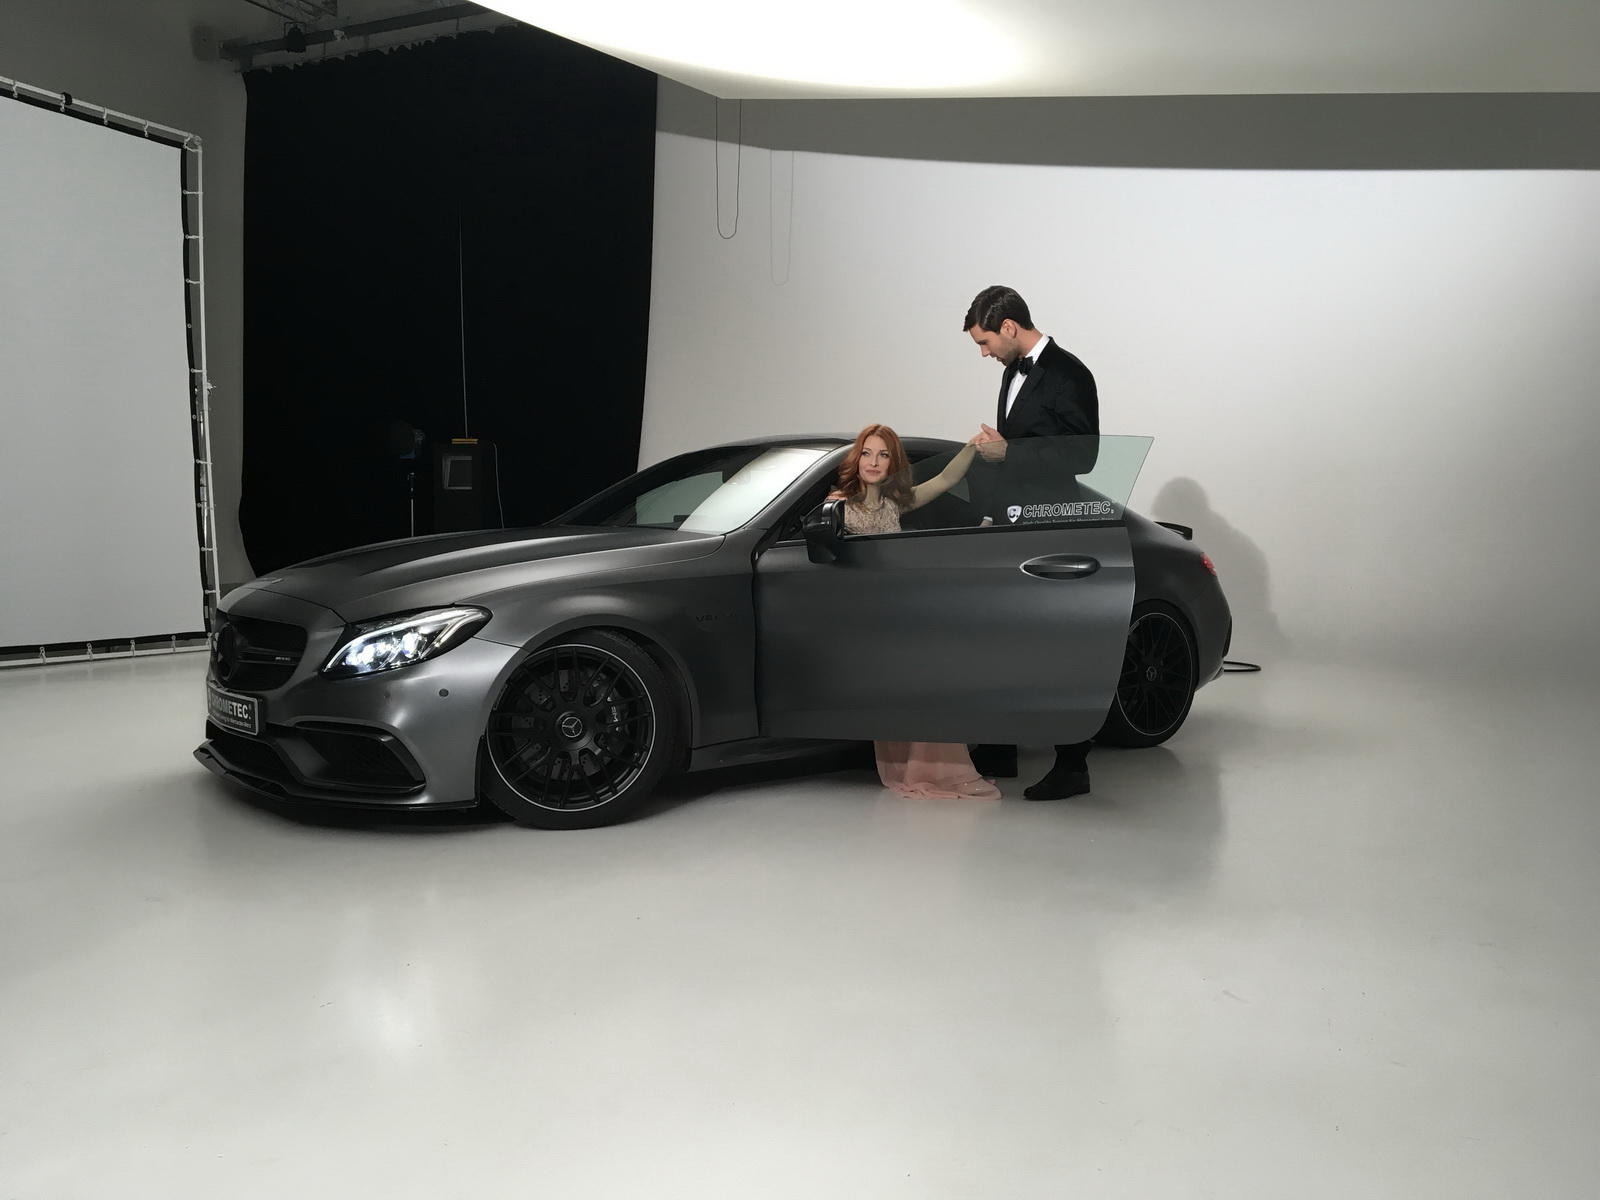 Mercedes-AMG C63 by Chrometec - Mercedes-AMG C63 by Chrometec